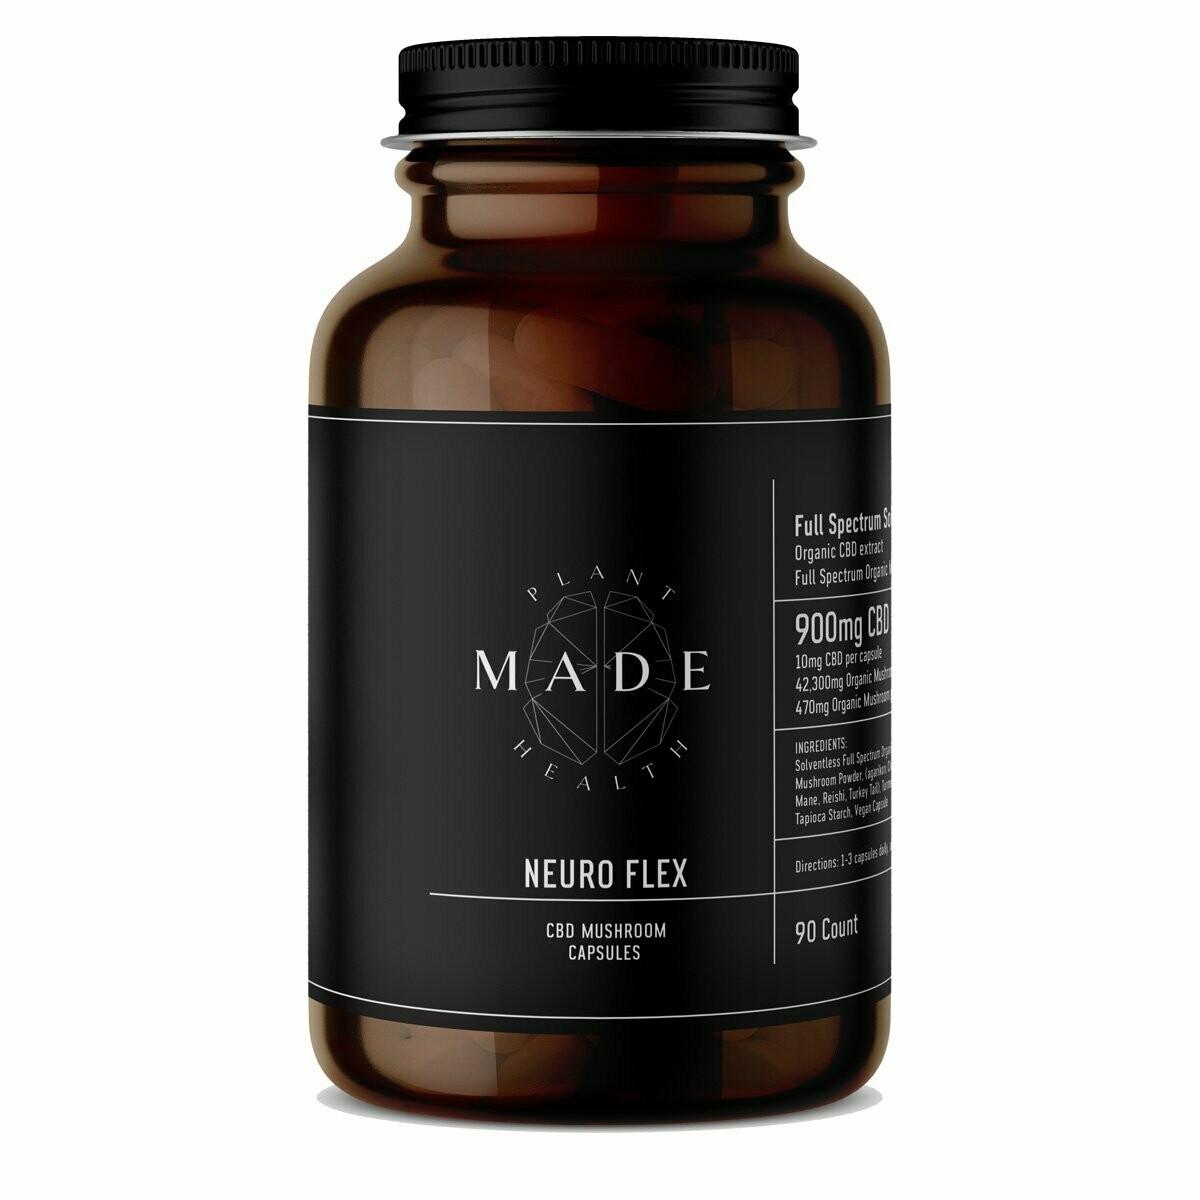 MADE Plant Health - Neuro Flex FS CBD and Mushroom Blend, 10mg/470mg per capsule - 90ct.